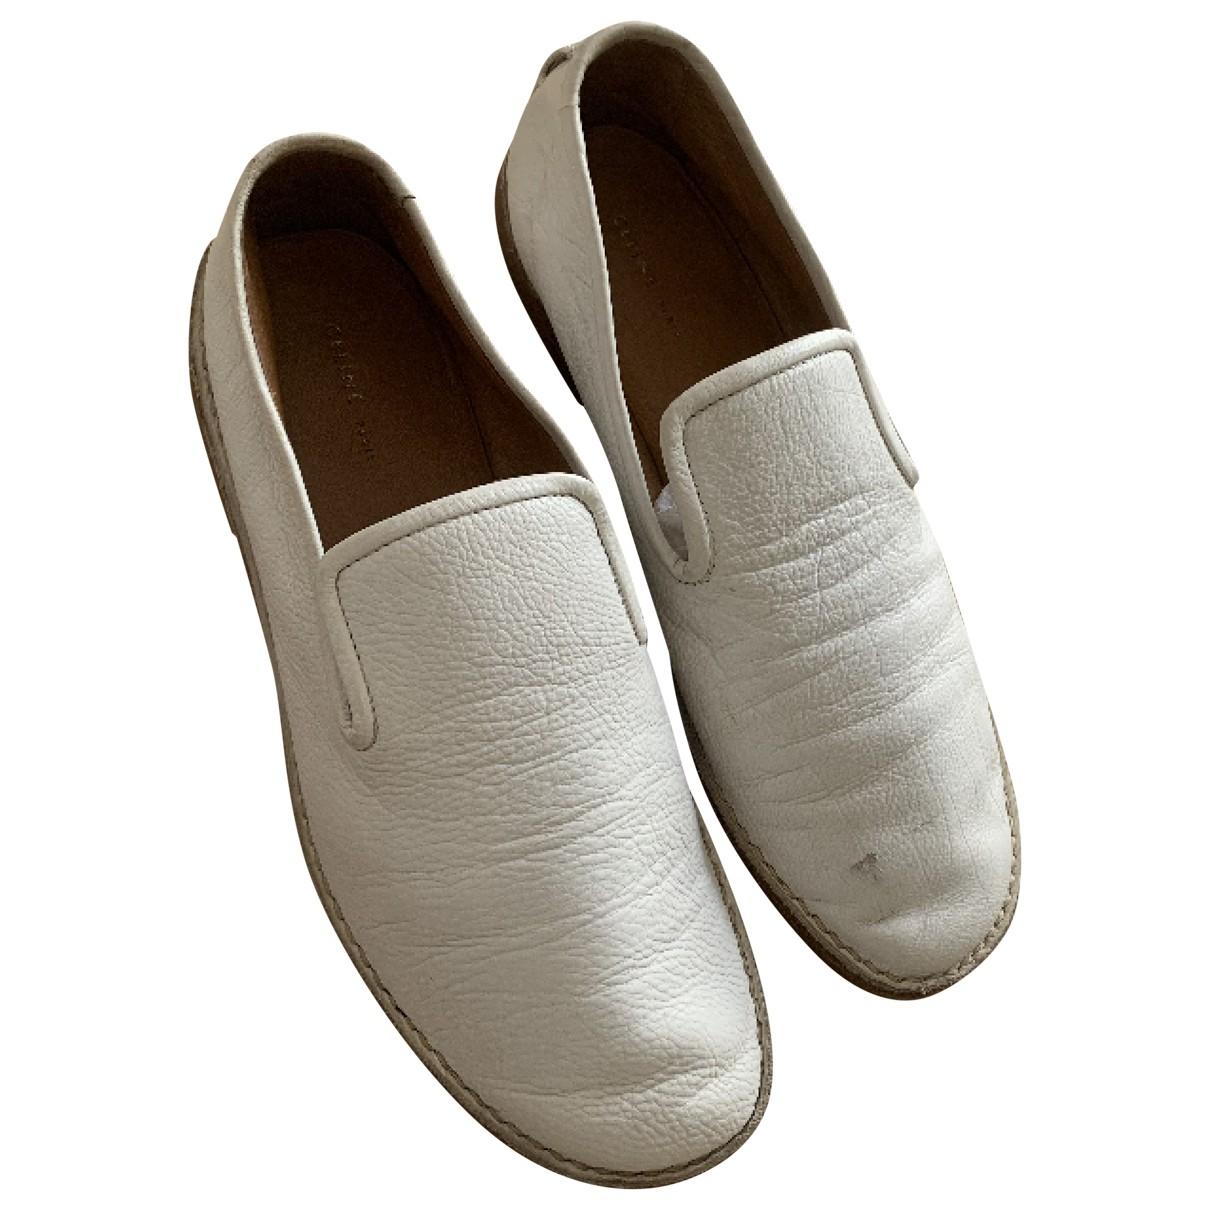 Celine \N White Leather Sandals for Women 36.5 EU